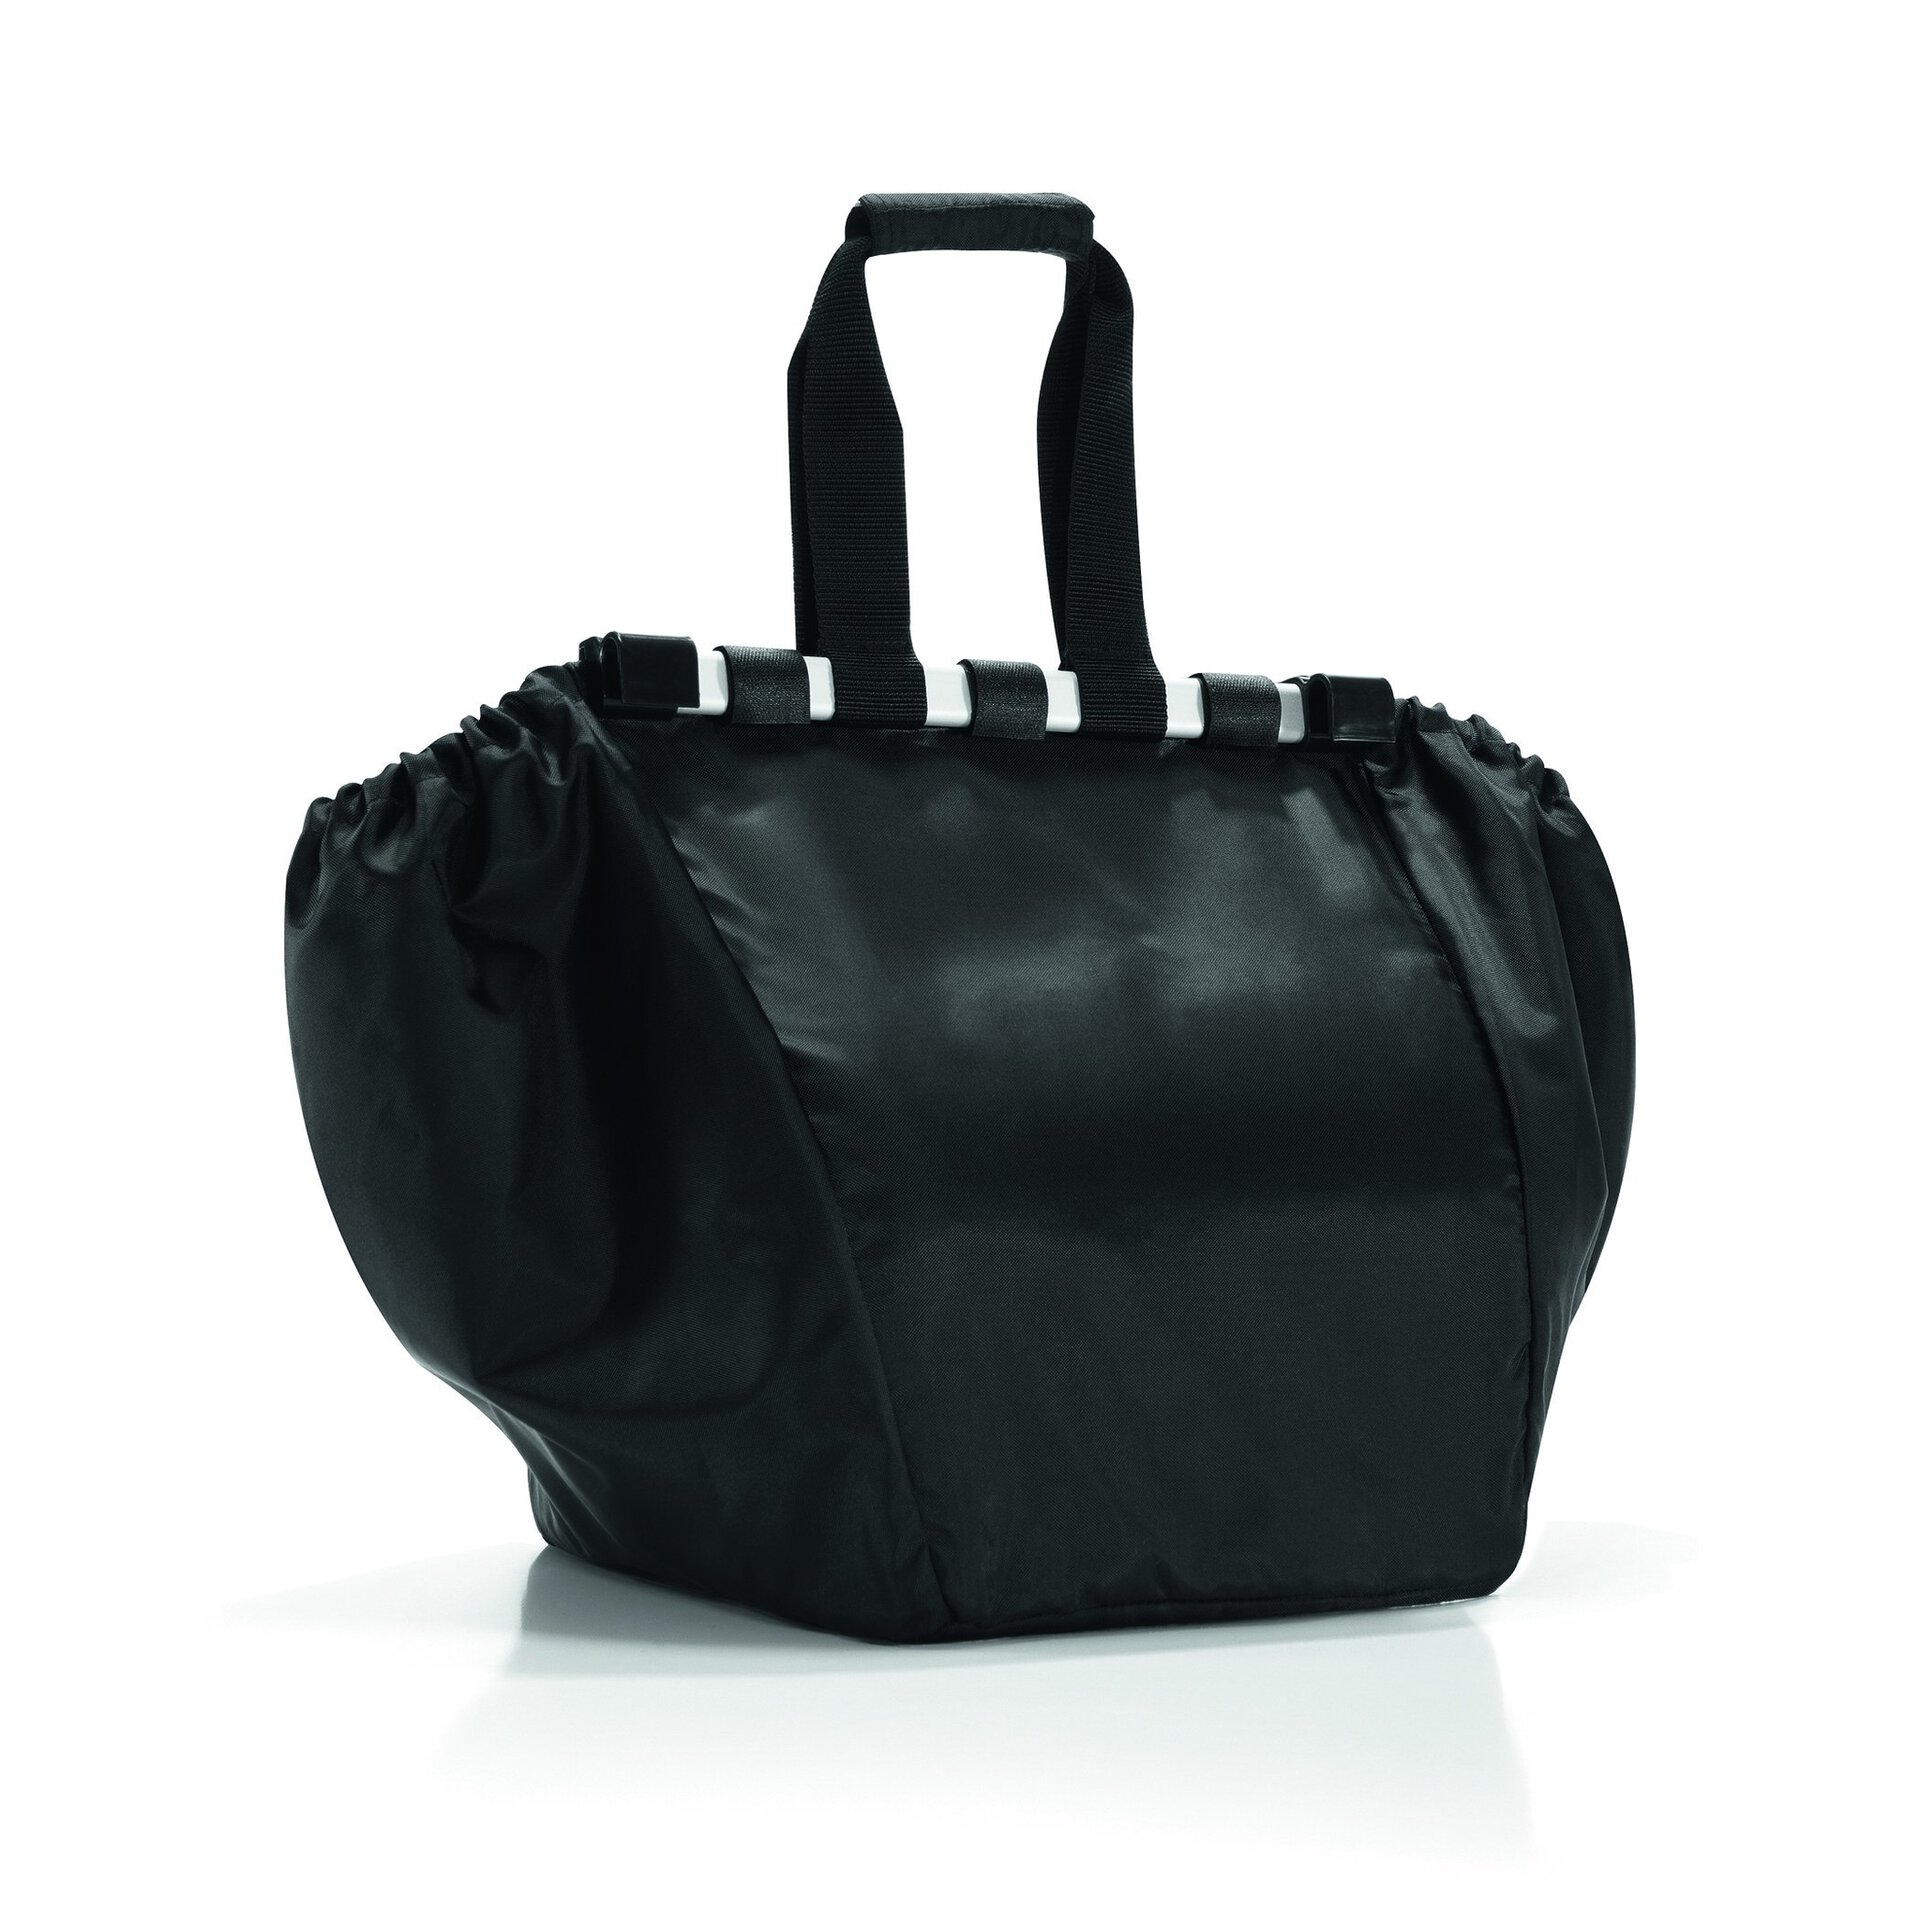 Tasche easyshoppingbag Reisenthel Textil schwarz